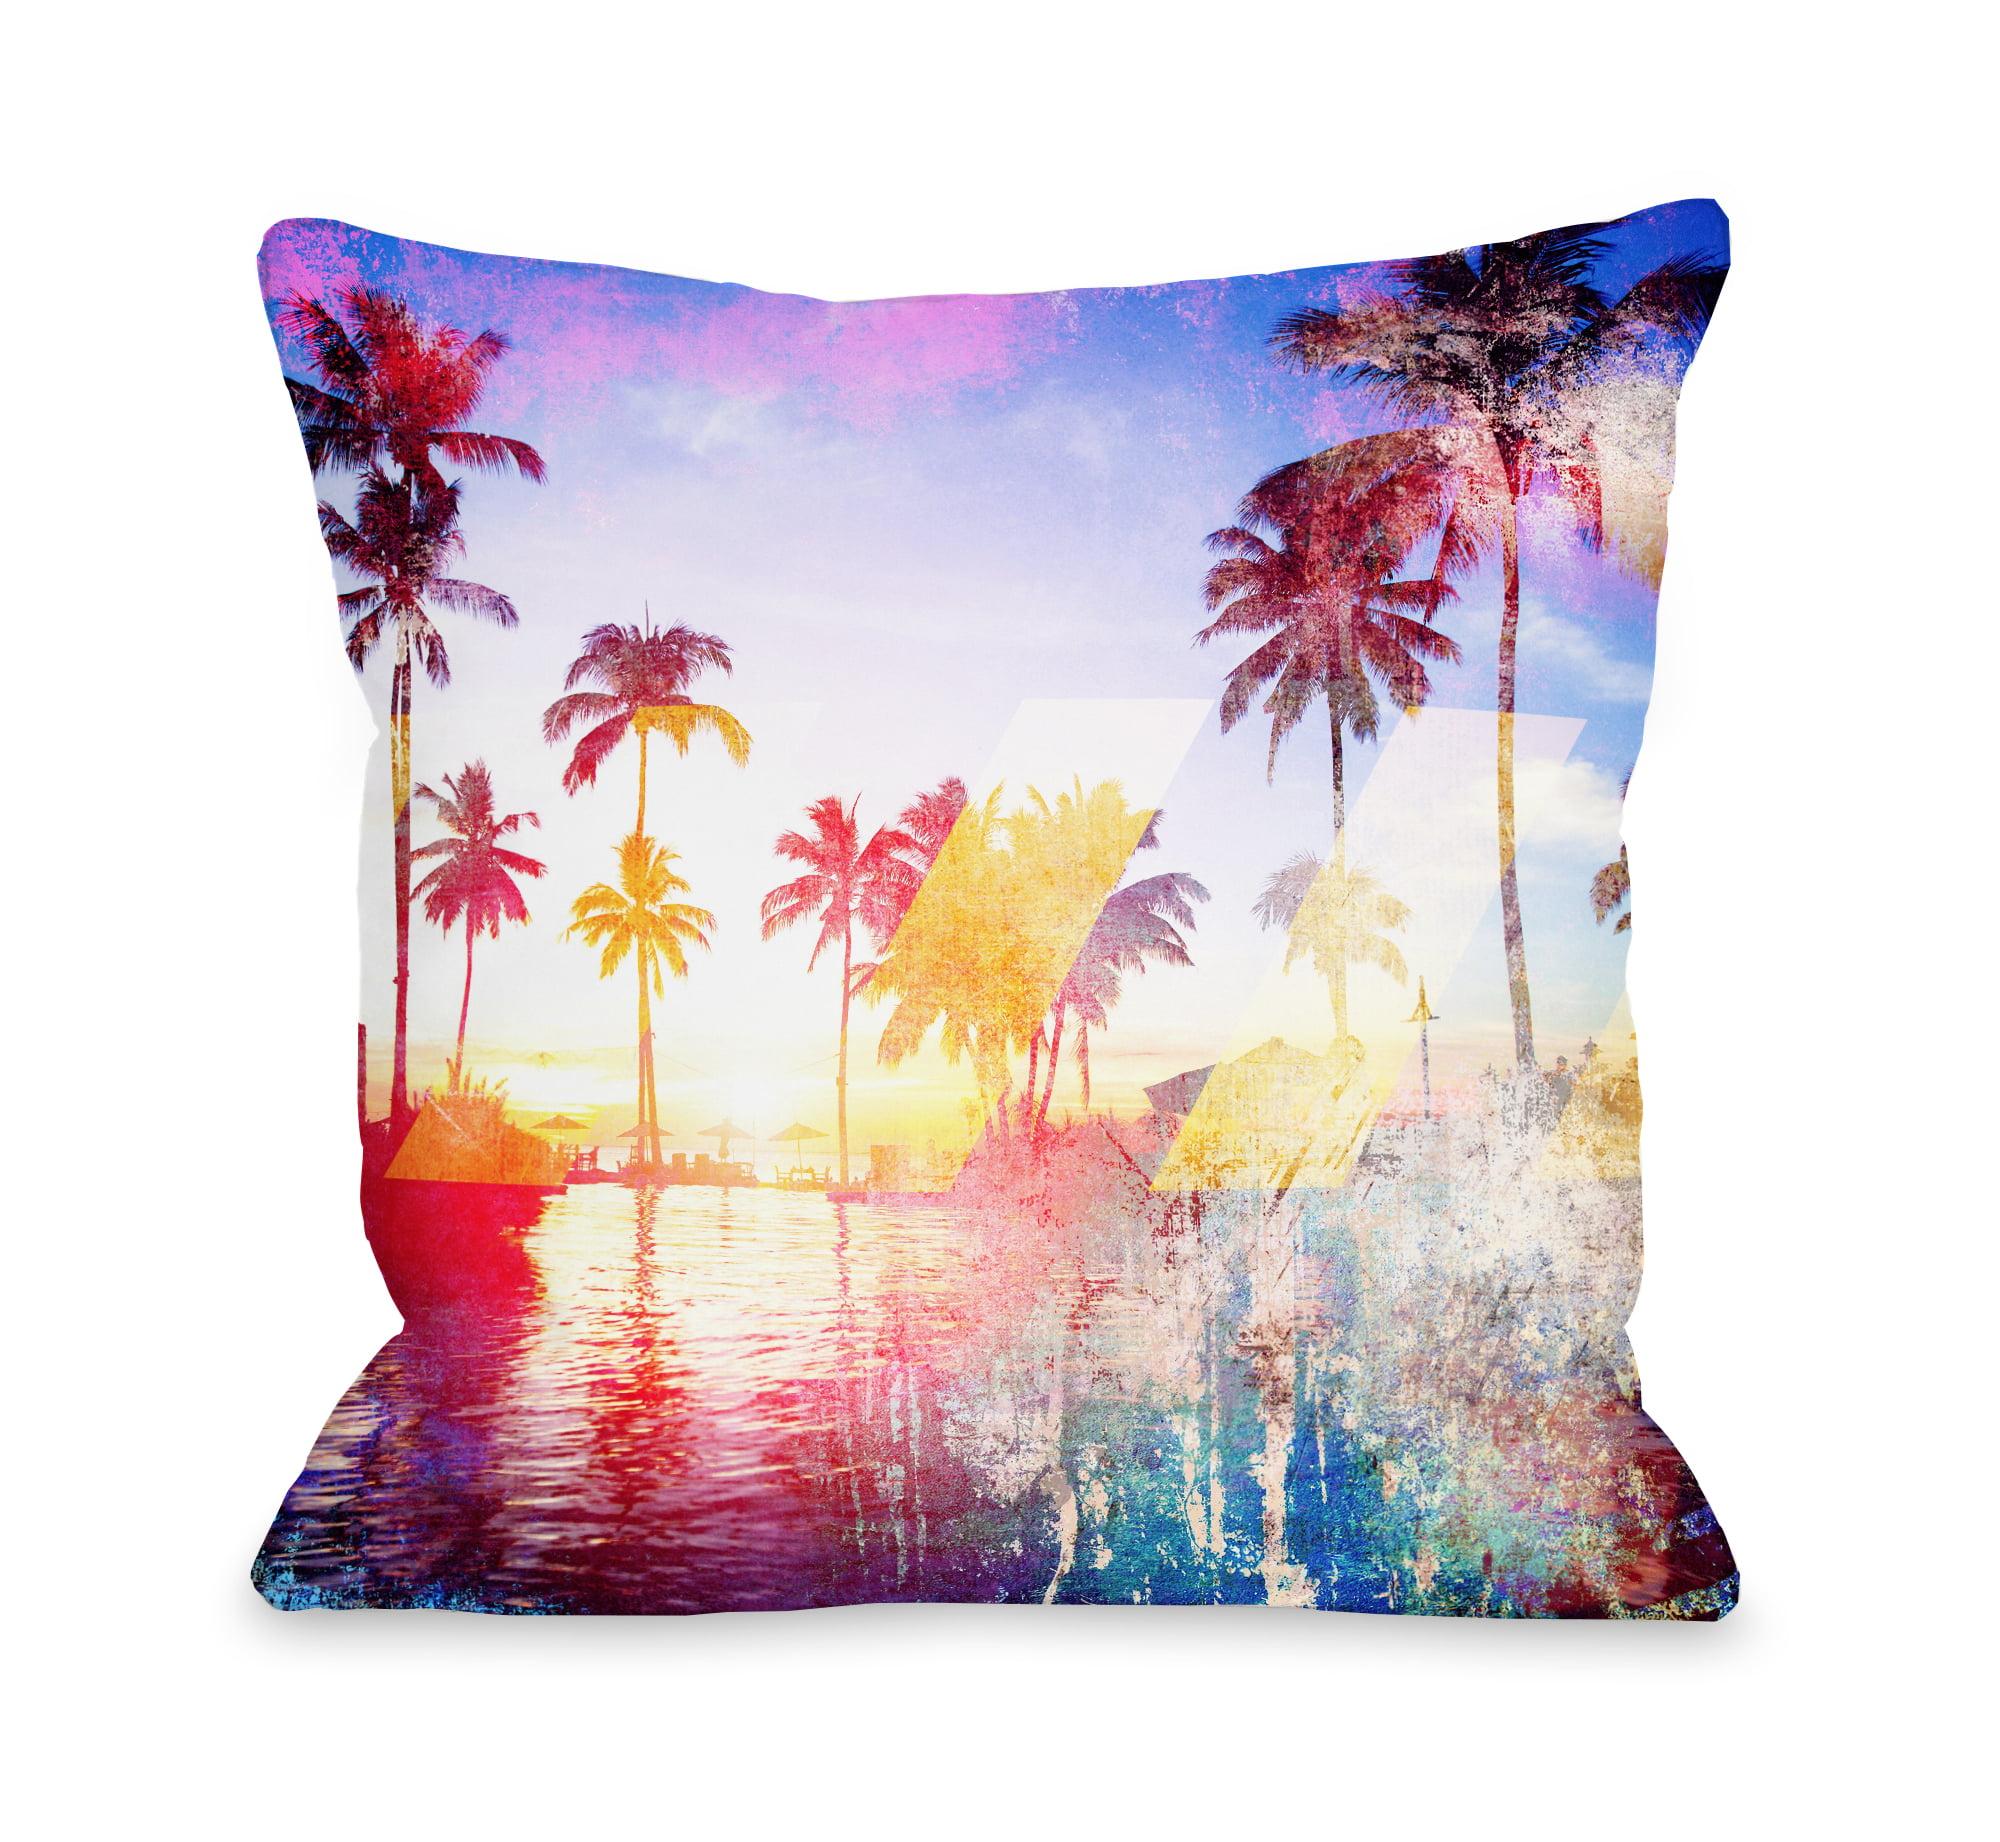 Santa Monica - Multi 18x18 Pillow by OBC